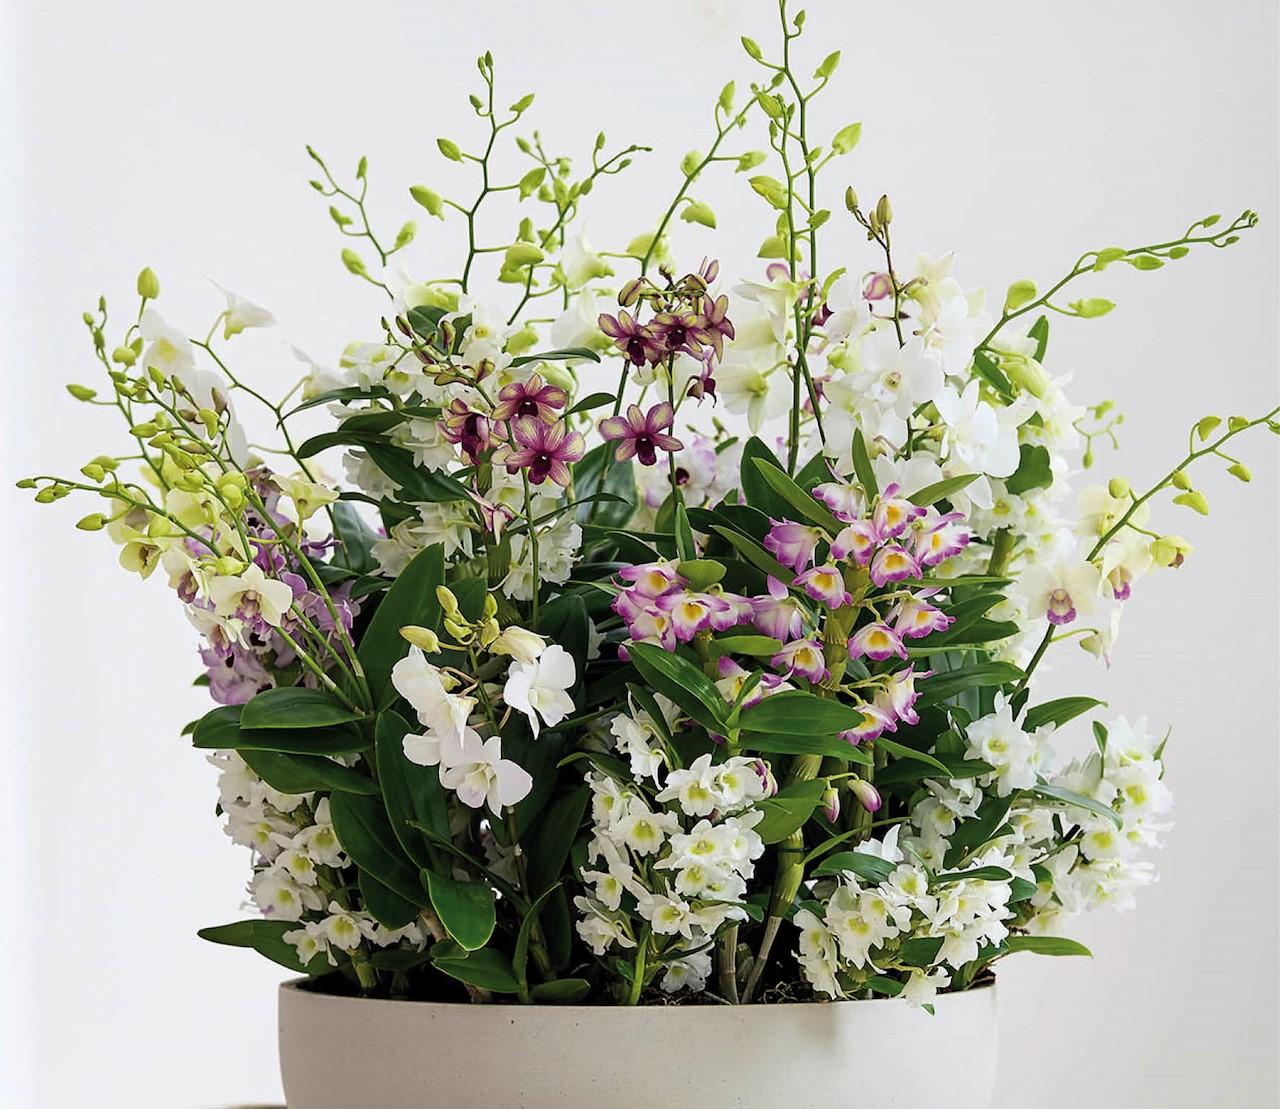 Dendrobium, de bamboe-orchidee